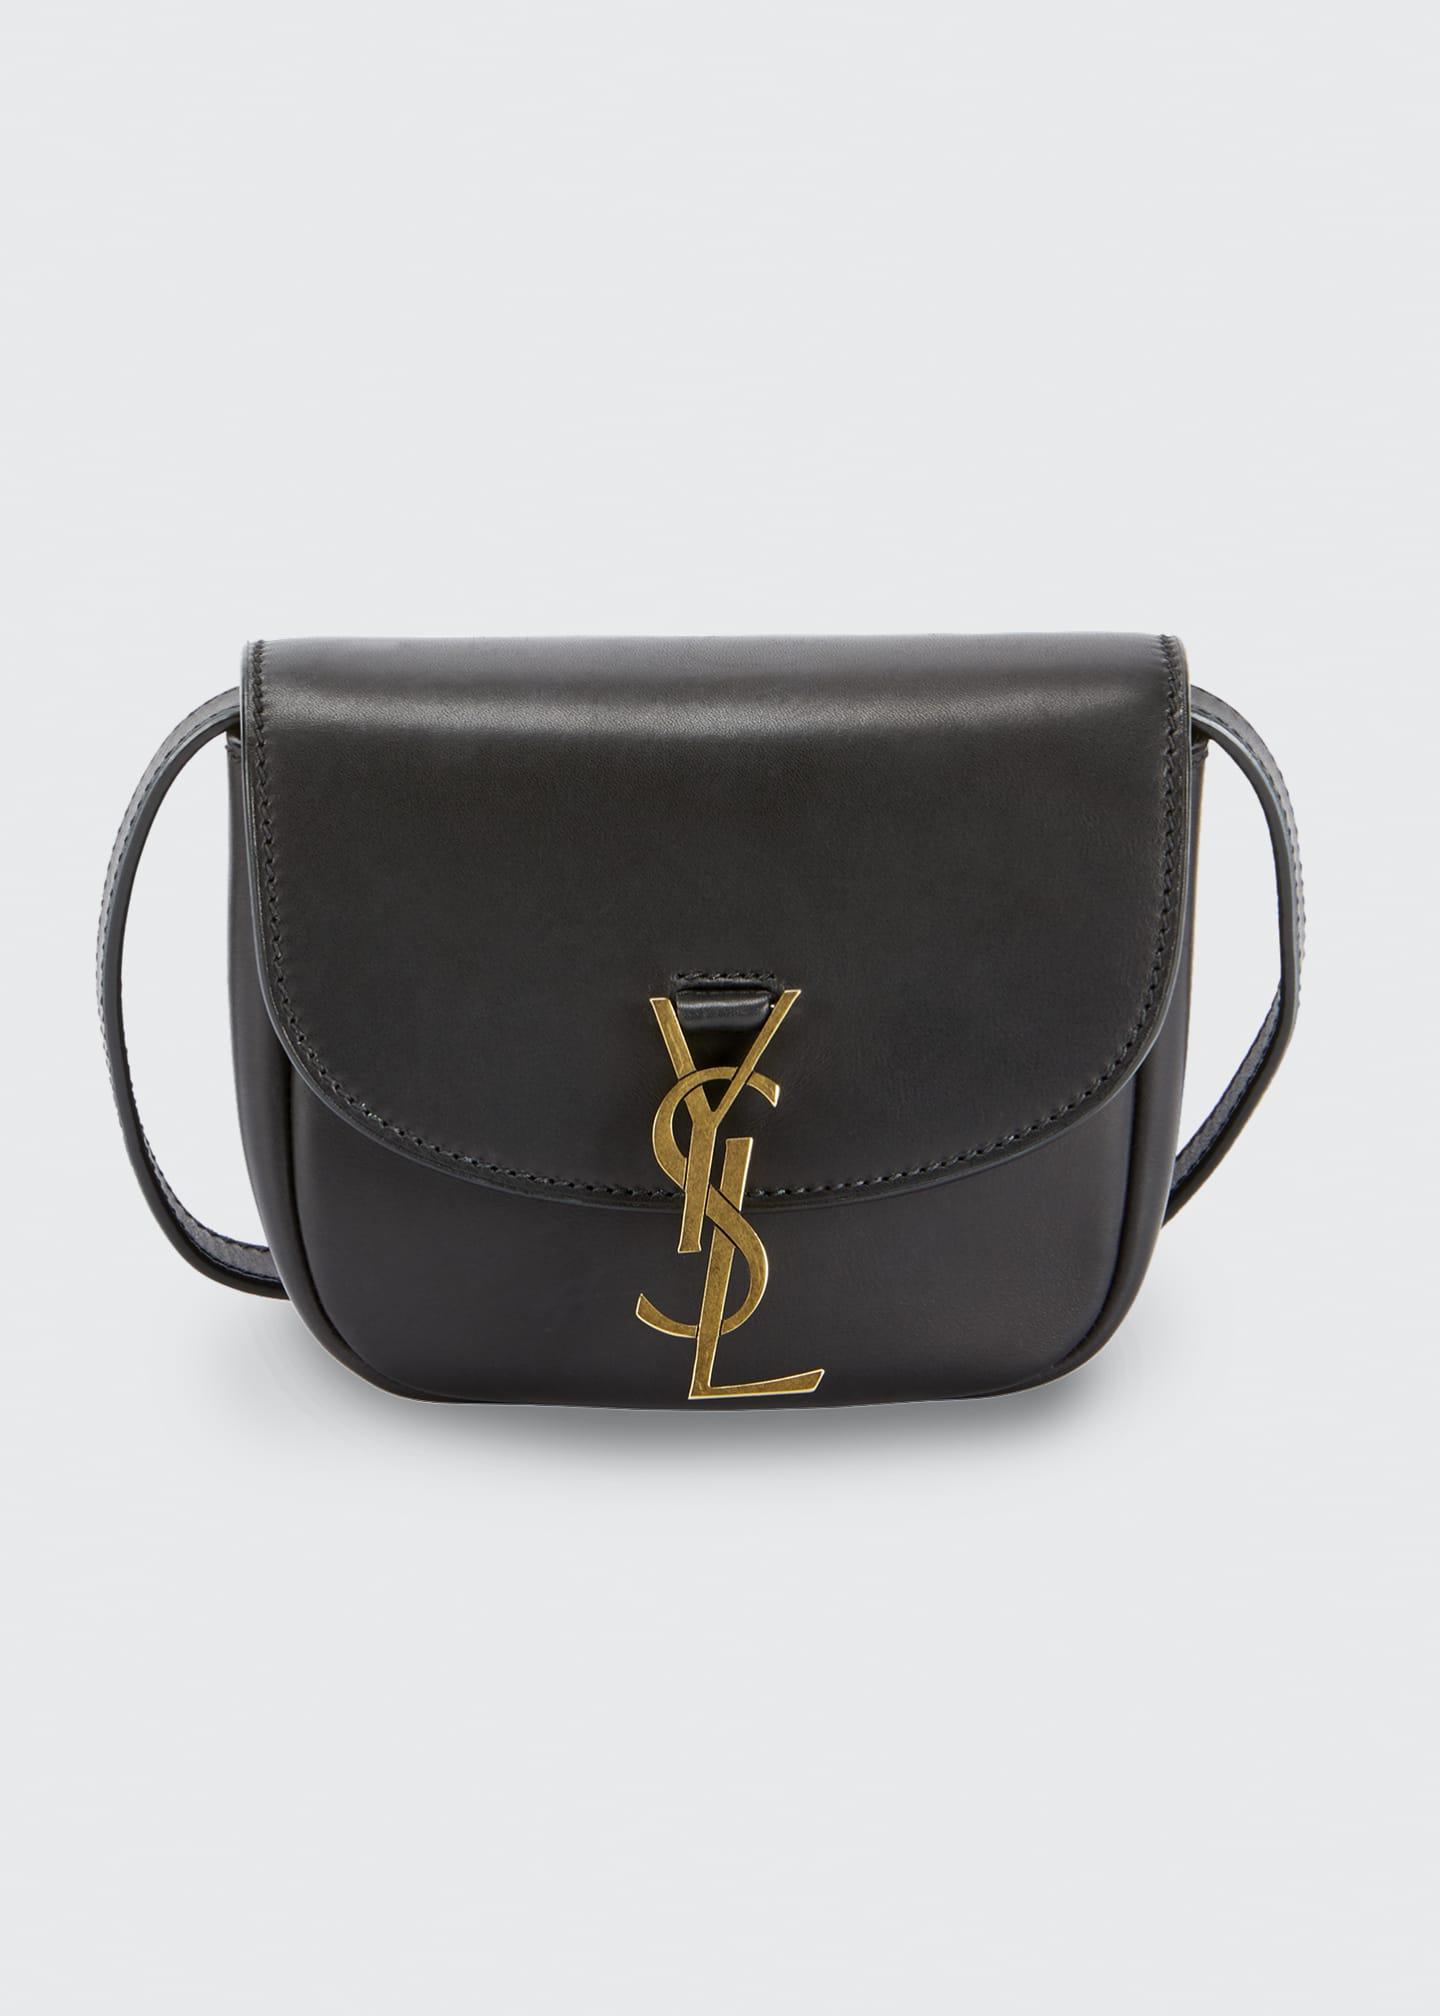 Saint Laurent Monogram YSL Medium Flap-Top Leather Crossbody Bag - Bergdorf Goodman